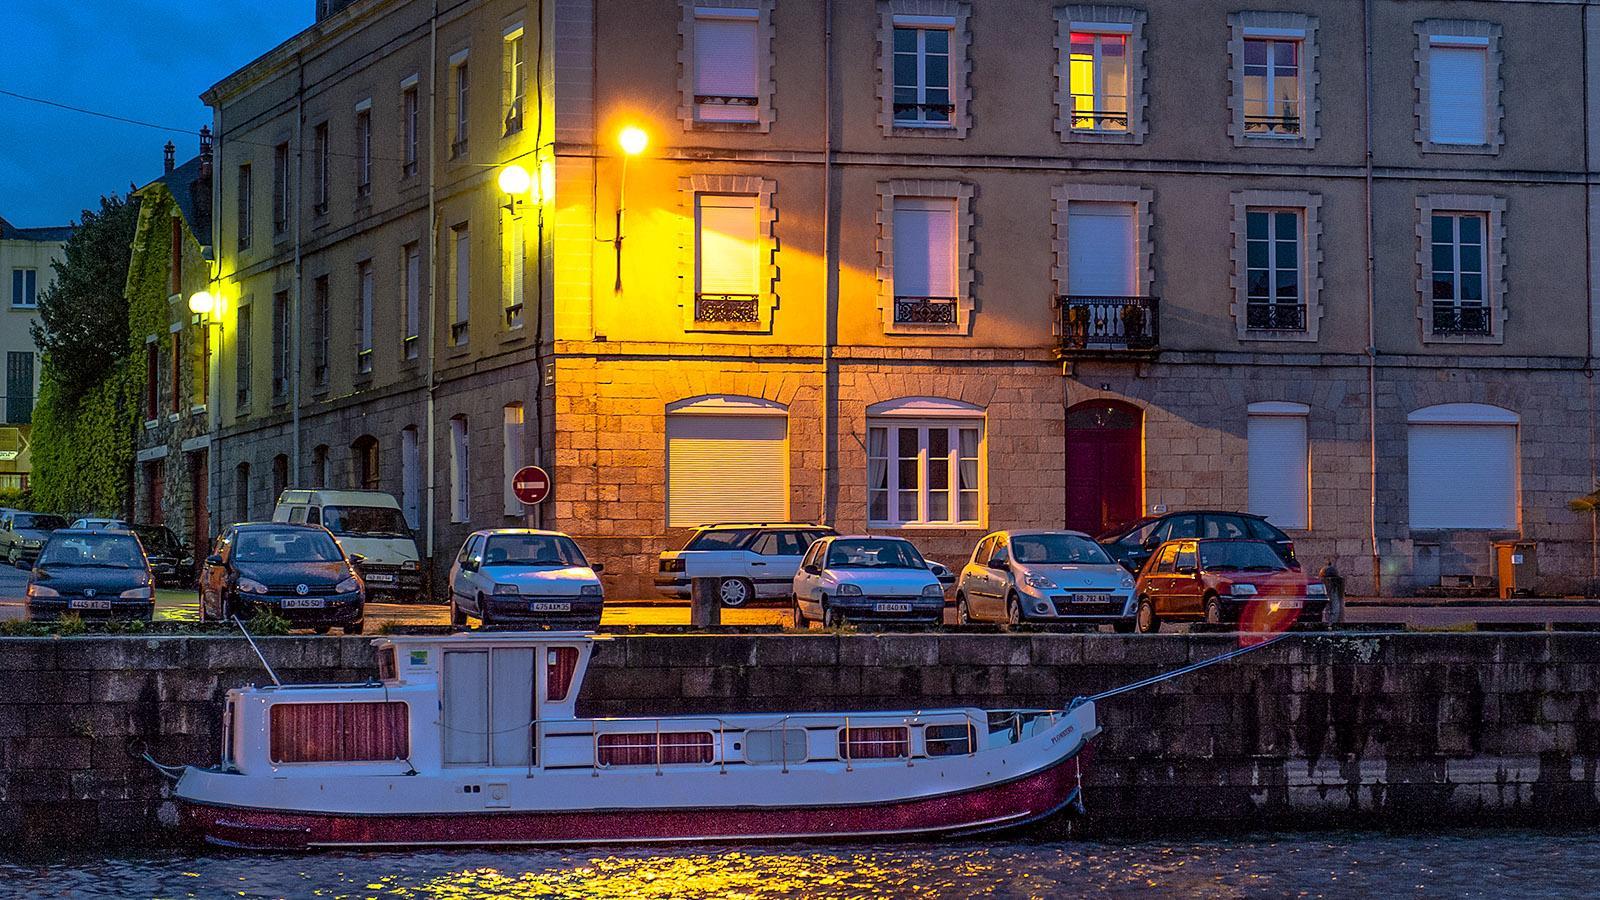 Redon: abends im Hafen. Foto: Hilke Maunder